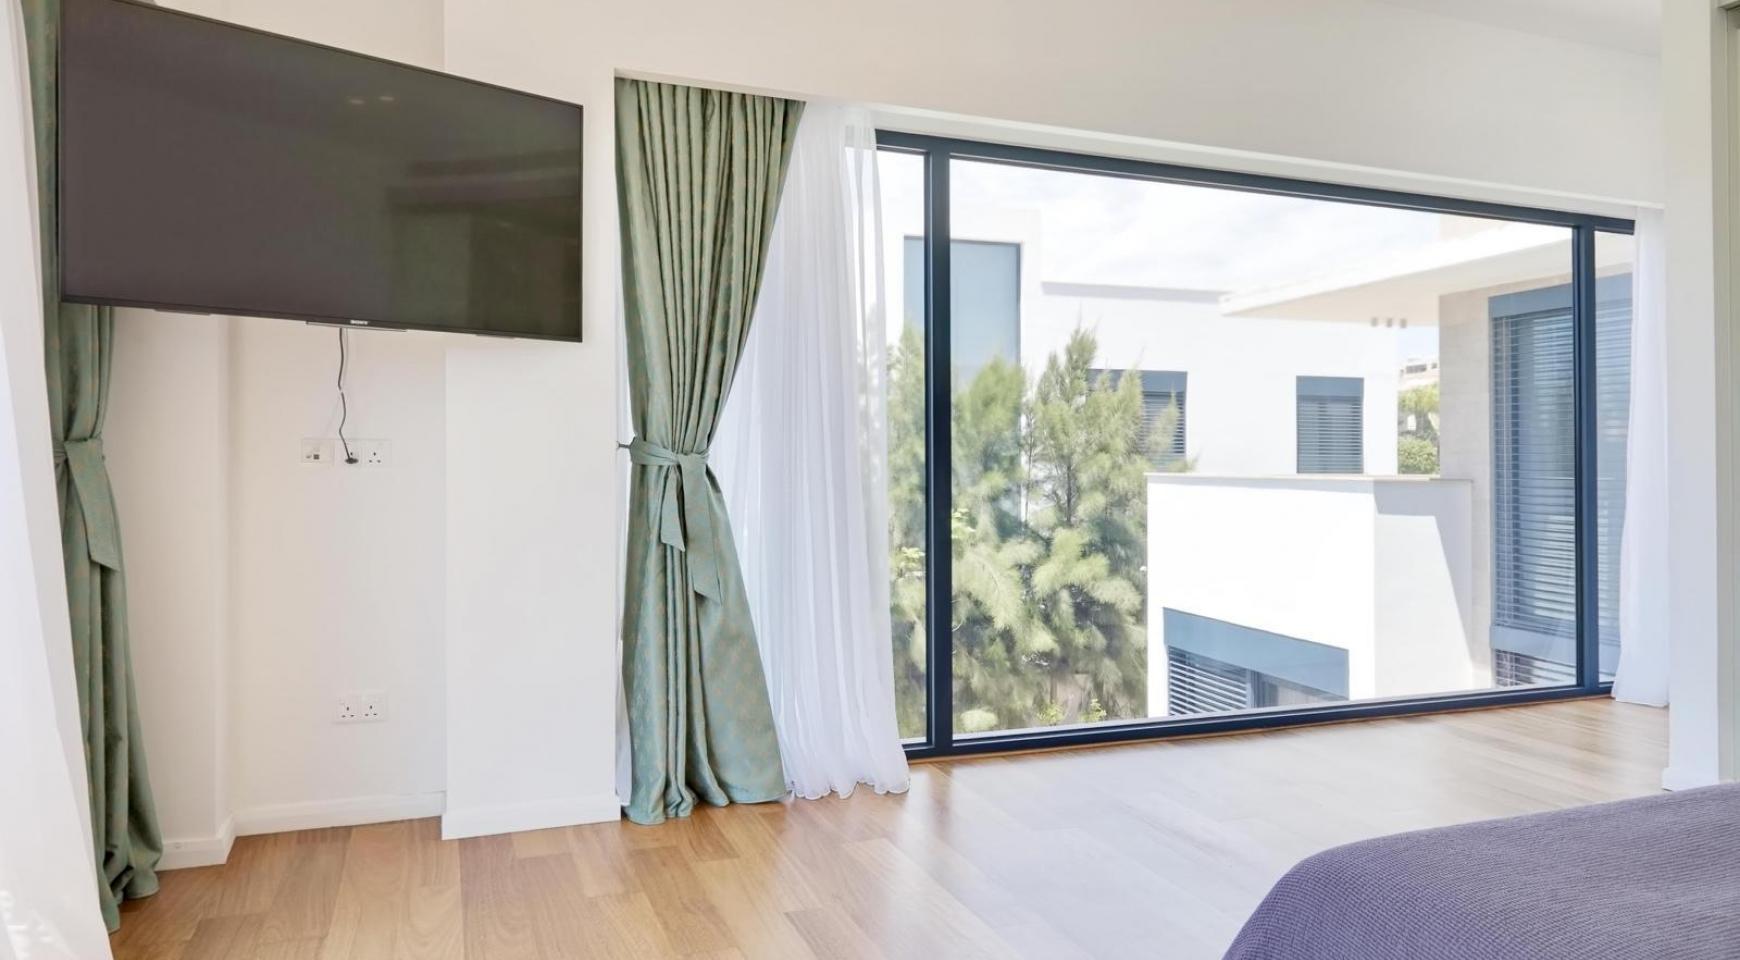 New Luxurious 4 Bedroom Villa in the Tourist Area - 32